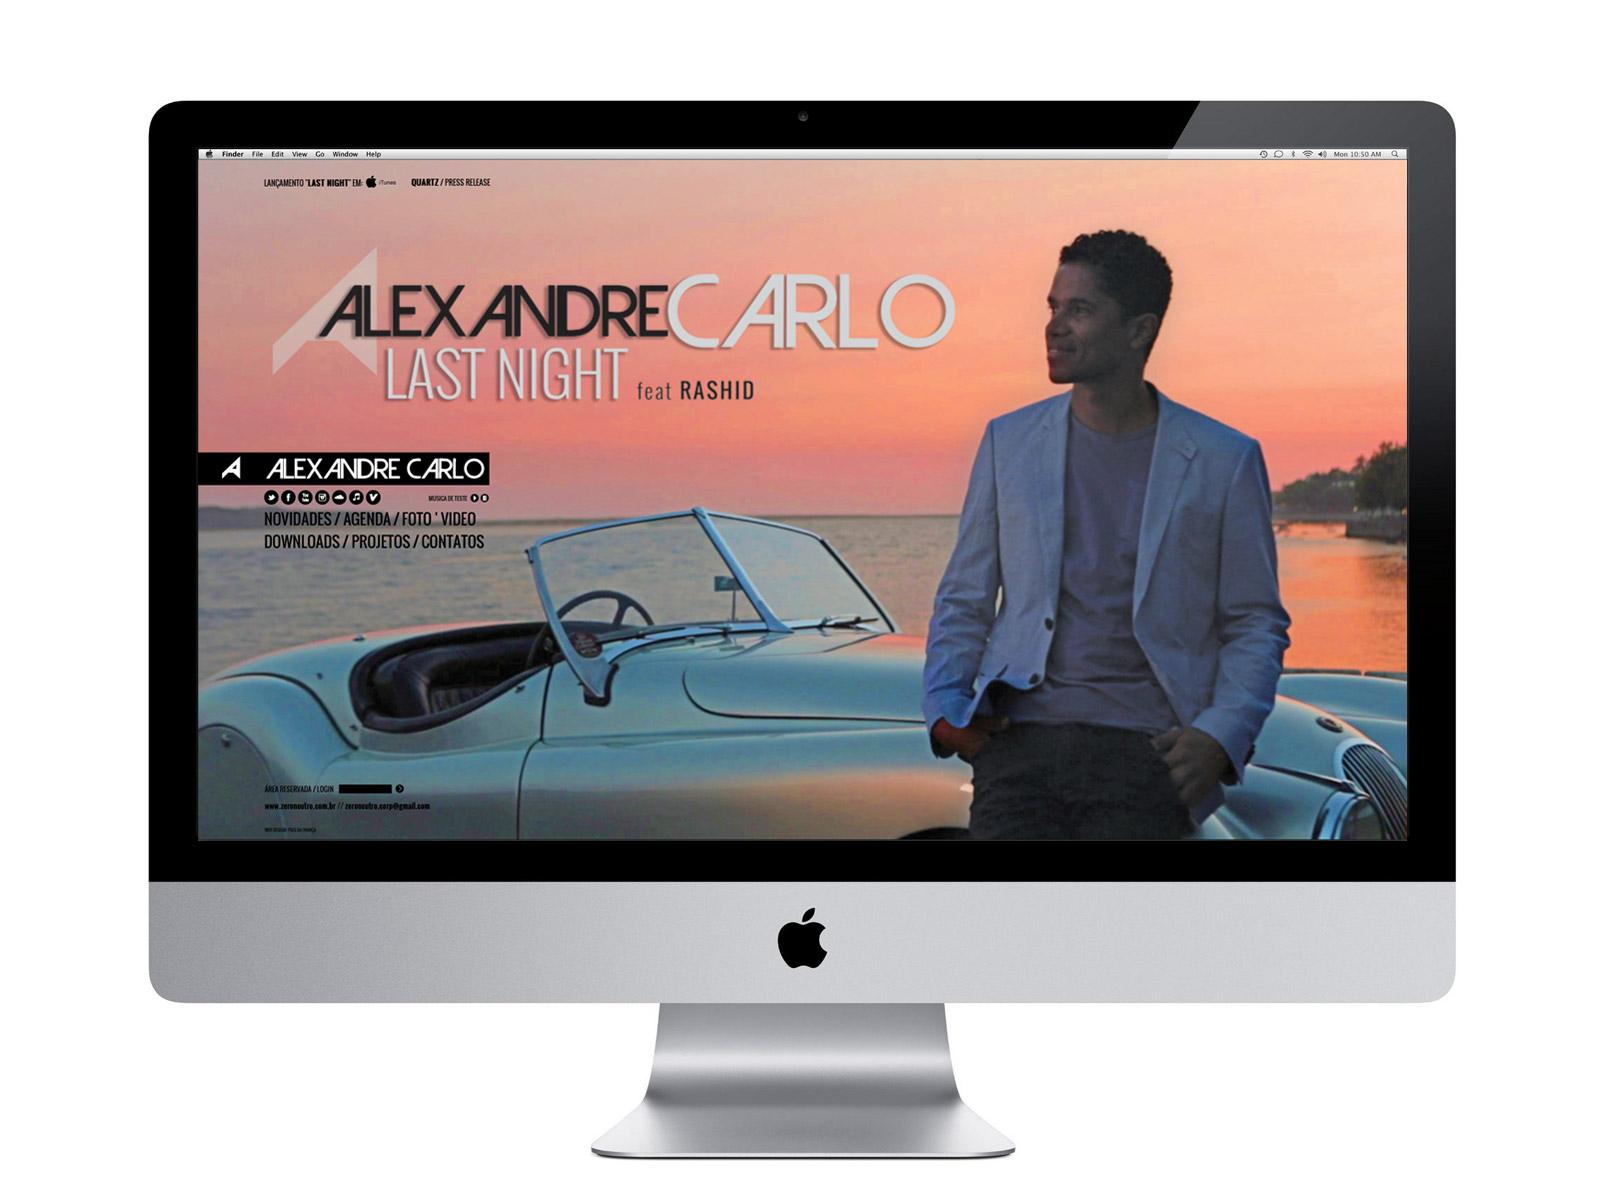 ALEXANDRE CARLO - 2